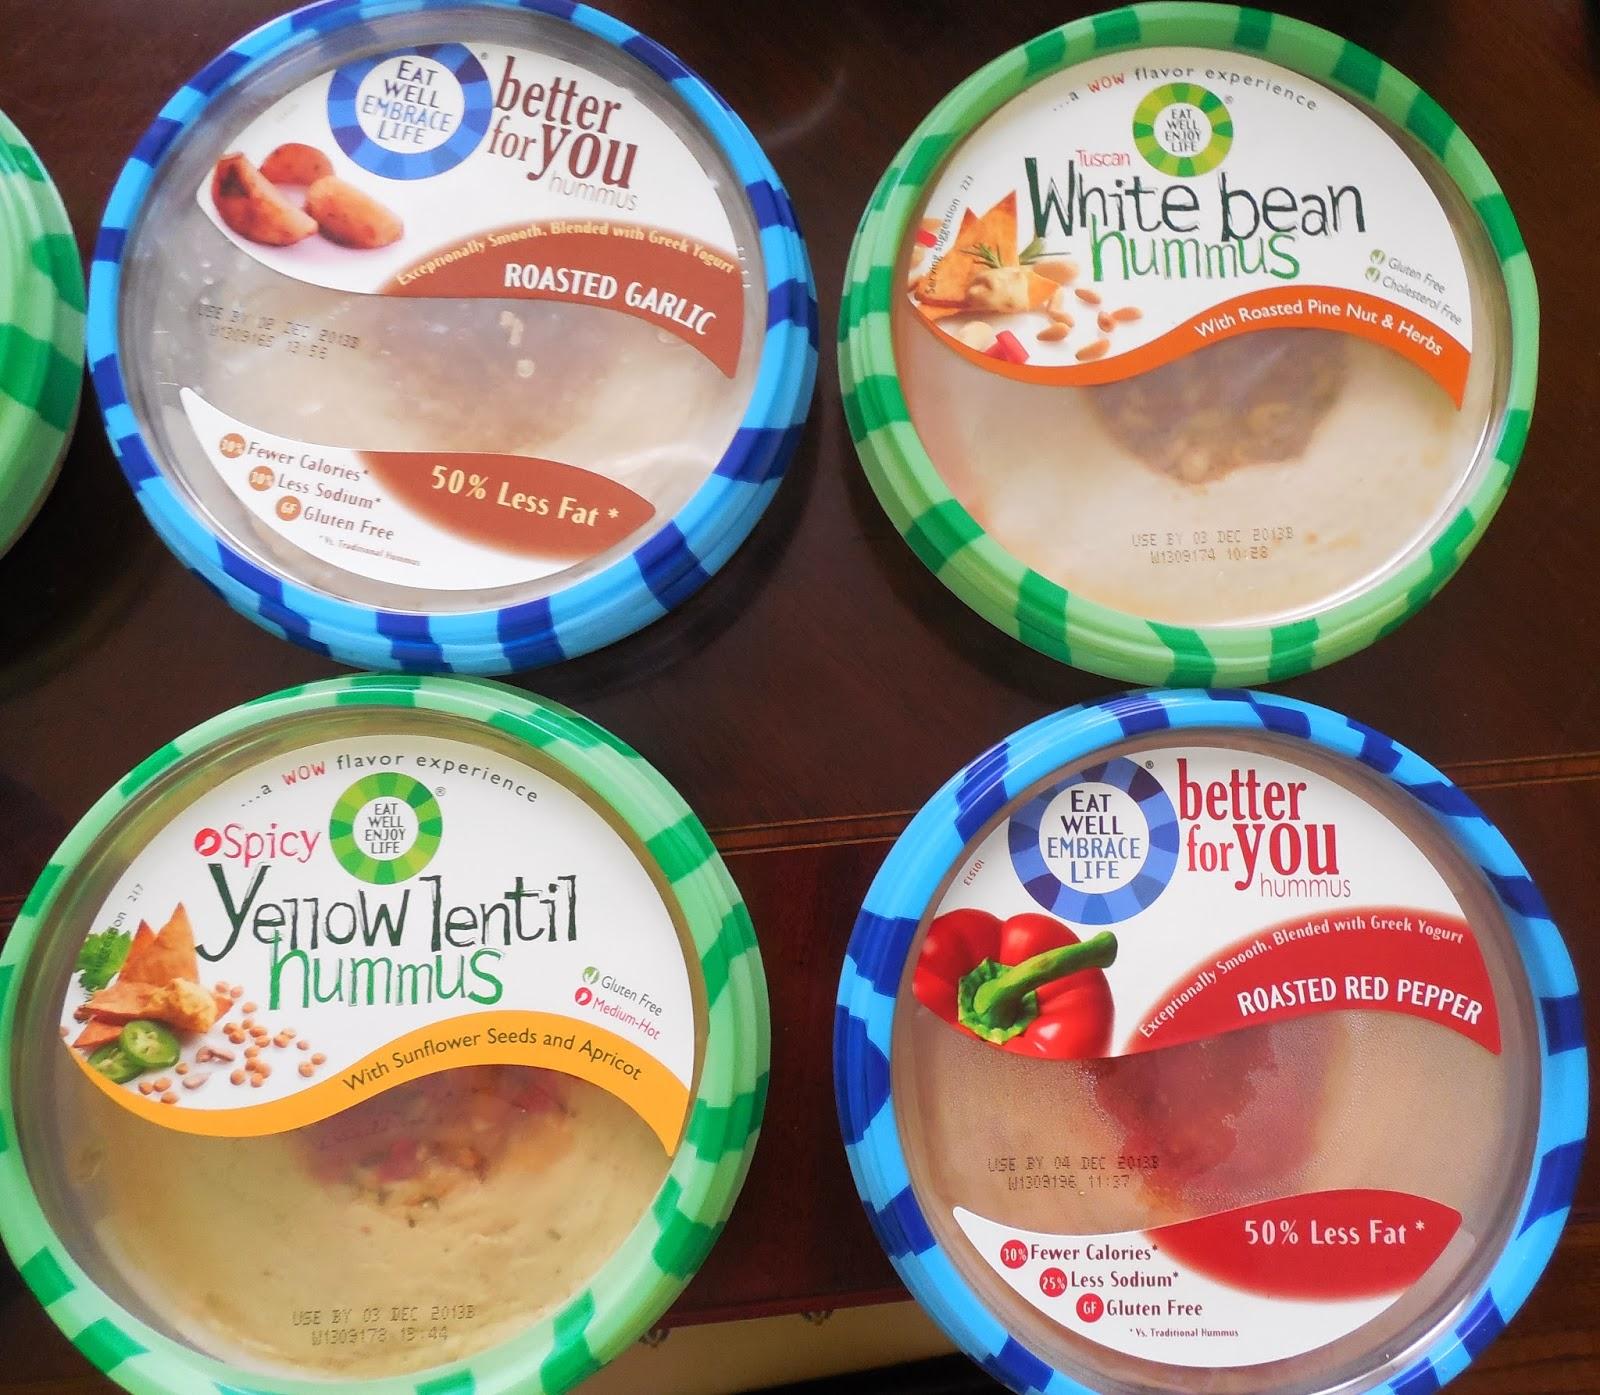 recipe: hummus mixed with greek yogurt [2]